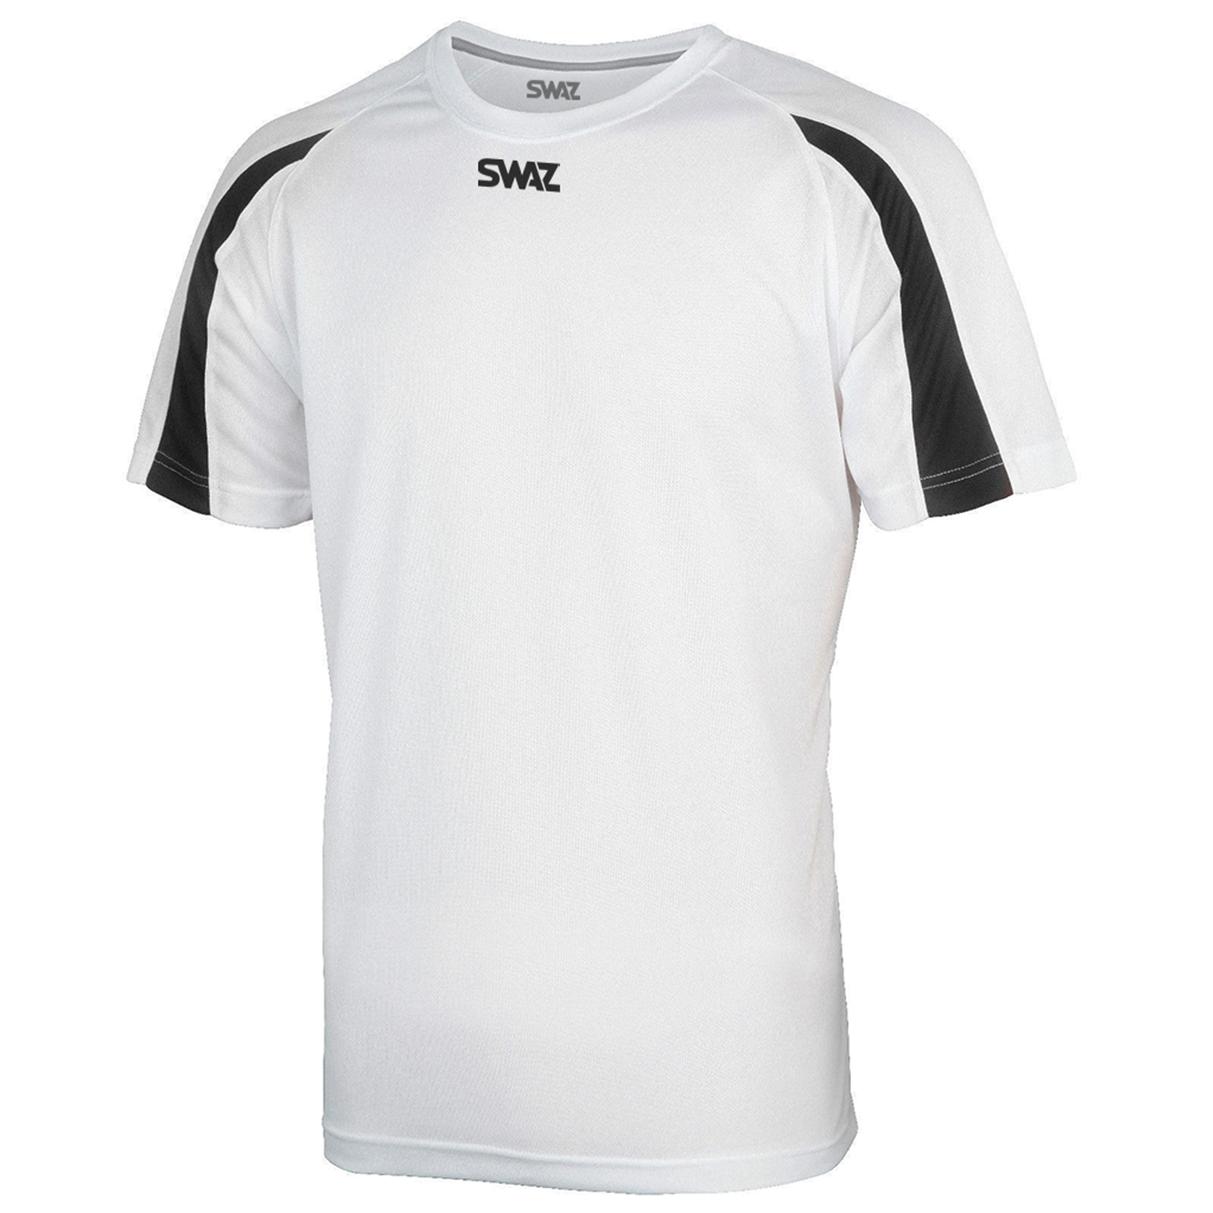 SWAZ Premier Training T-Shirt – White/Black